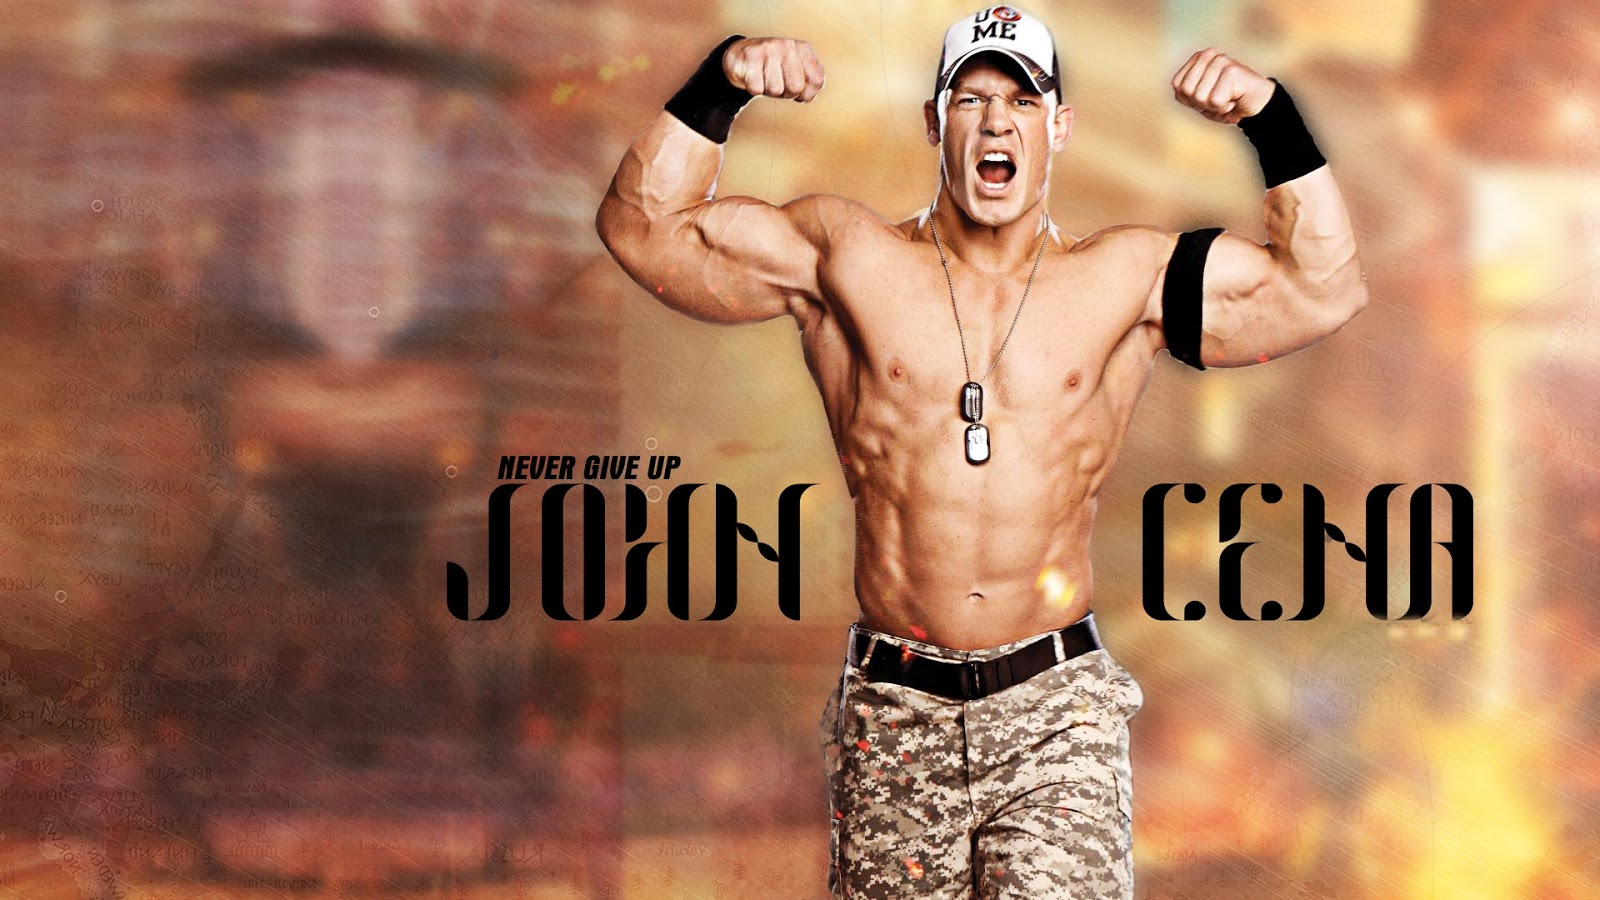 Never Give Up John Cena WWE Wallpaper HD